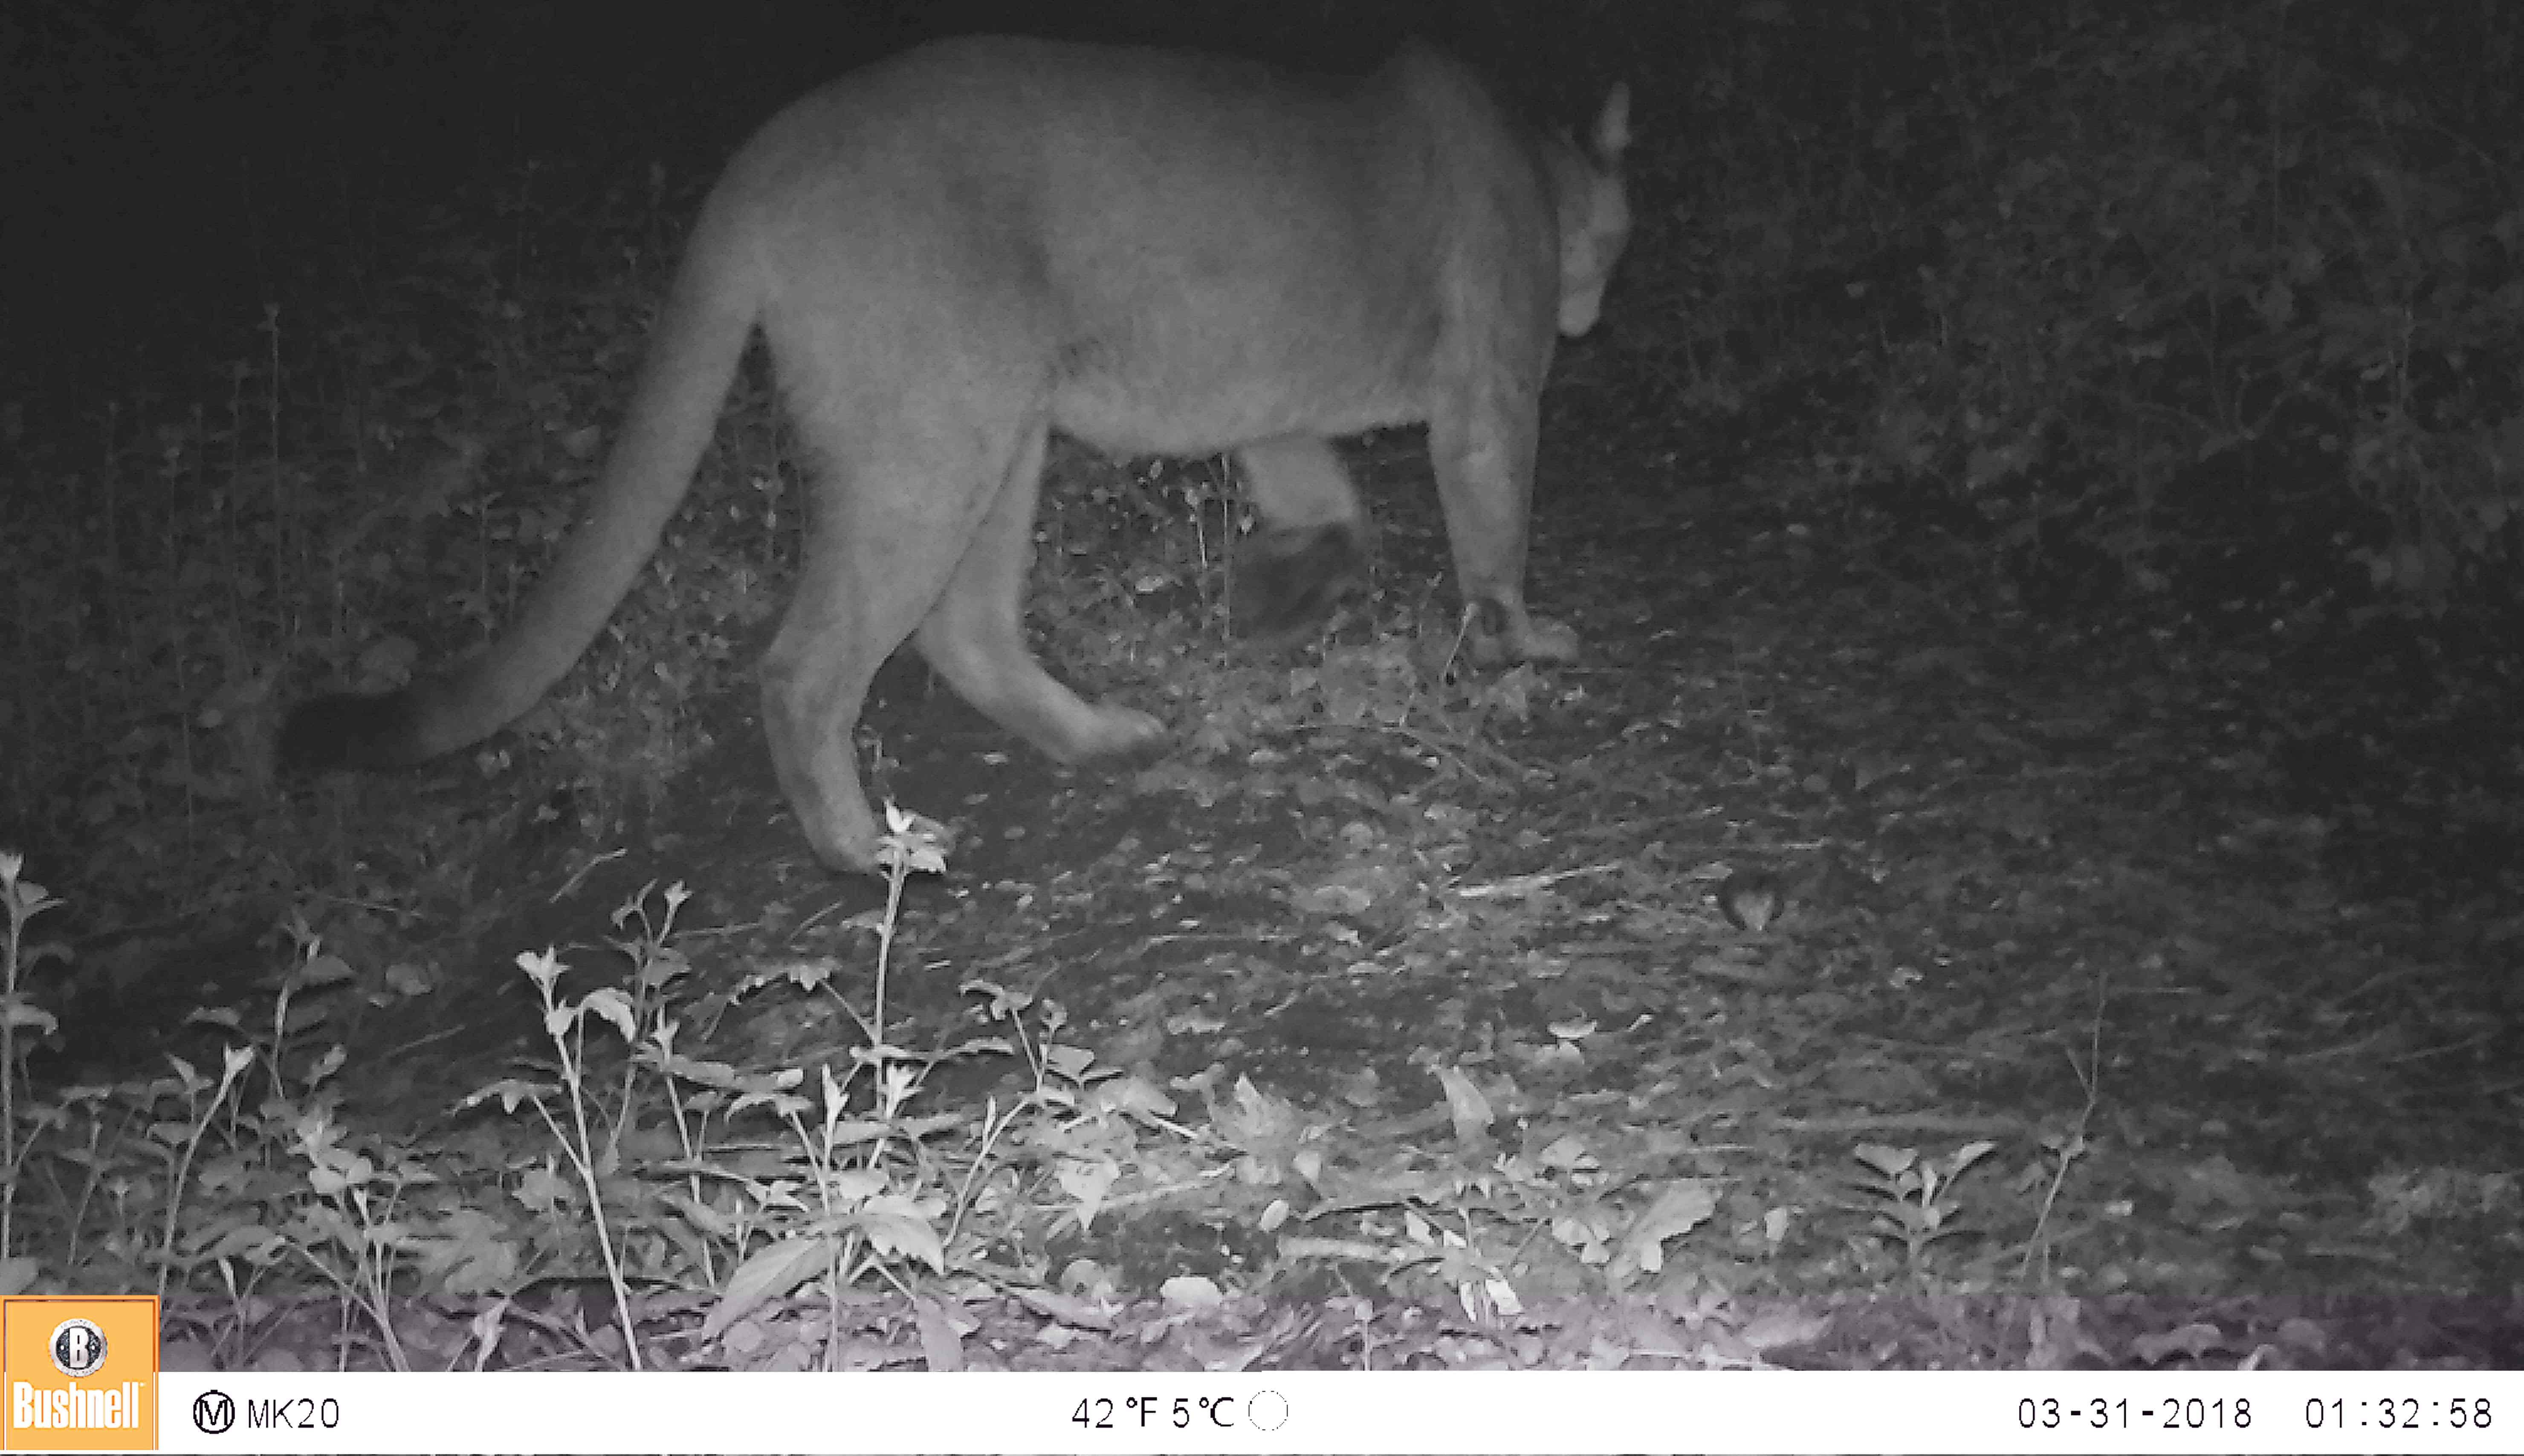 Pumas adjust their schedules in order to avoid people.